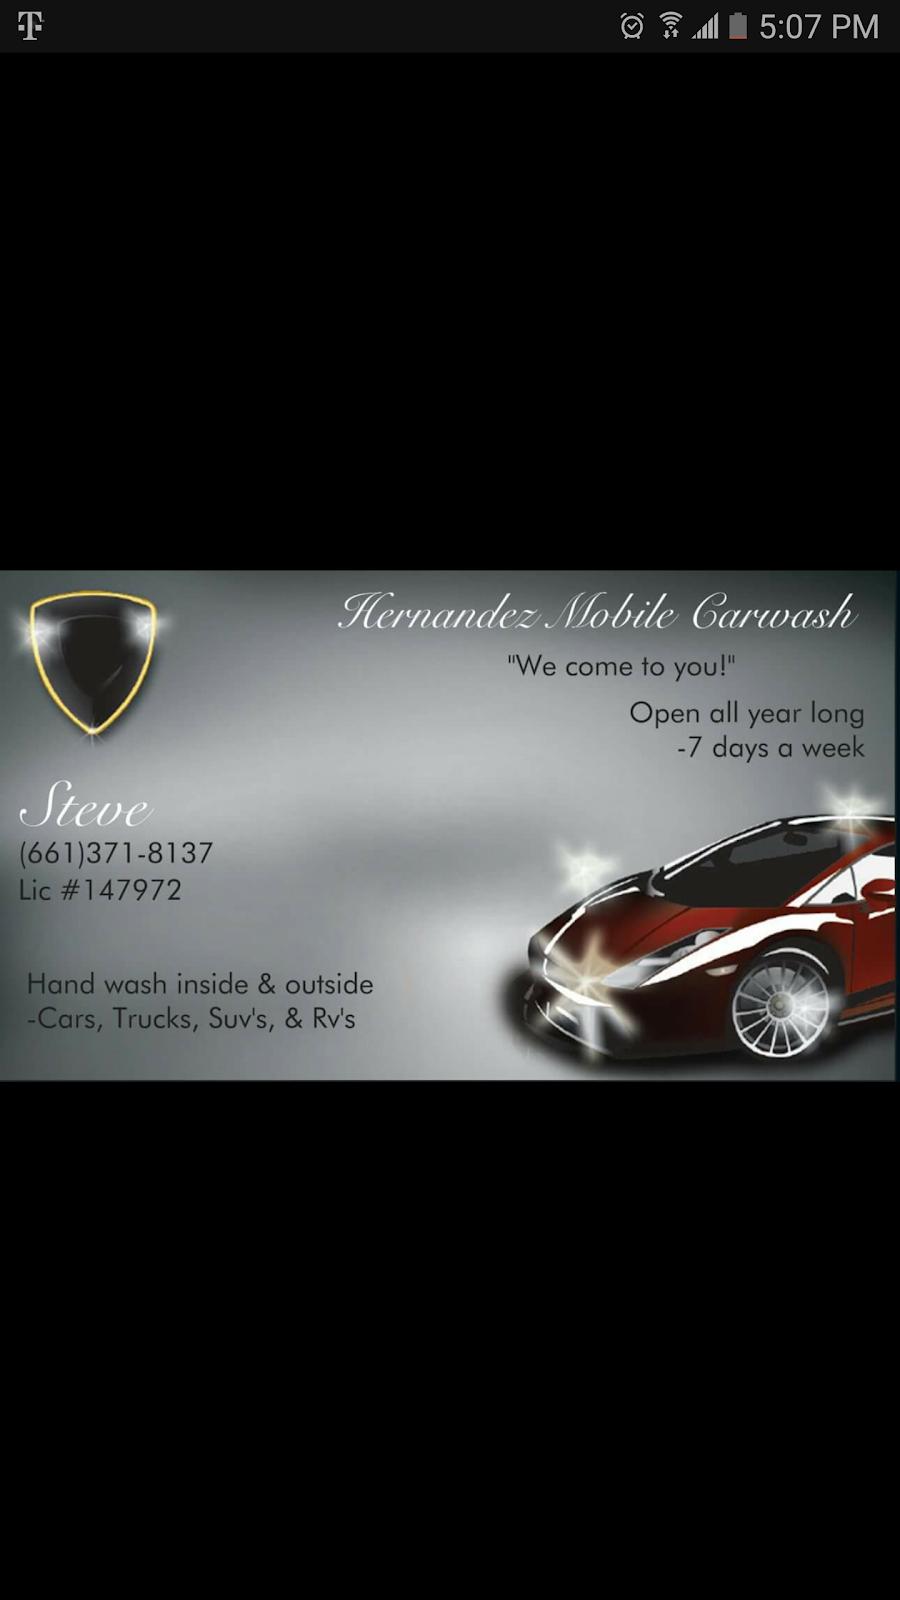 Hernandez Mobile Carwash - car wash    Photo 1 of 1   Address: 0000, Bakersfield, CA 93306, USA   Phone: (661) 371-8137